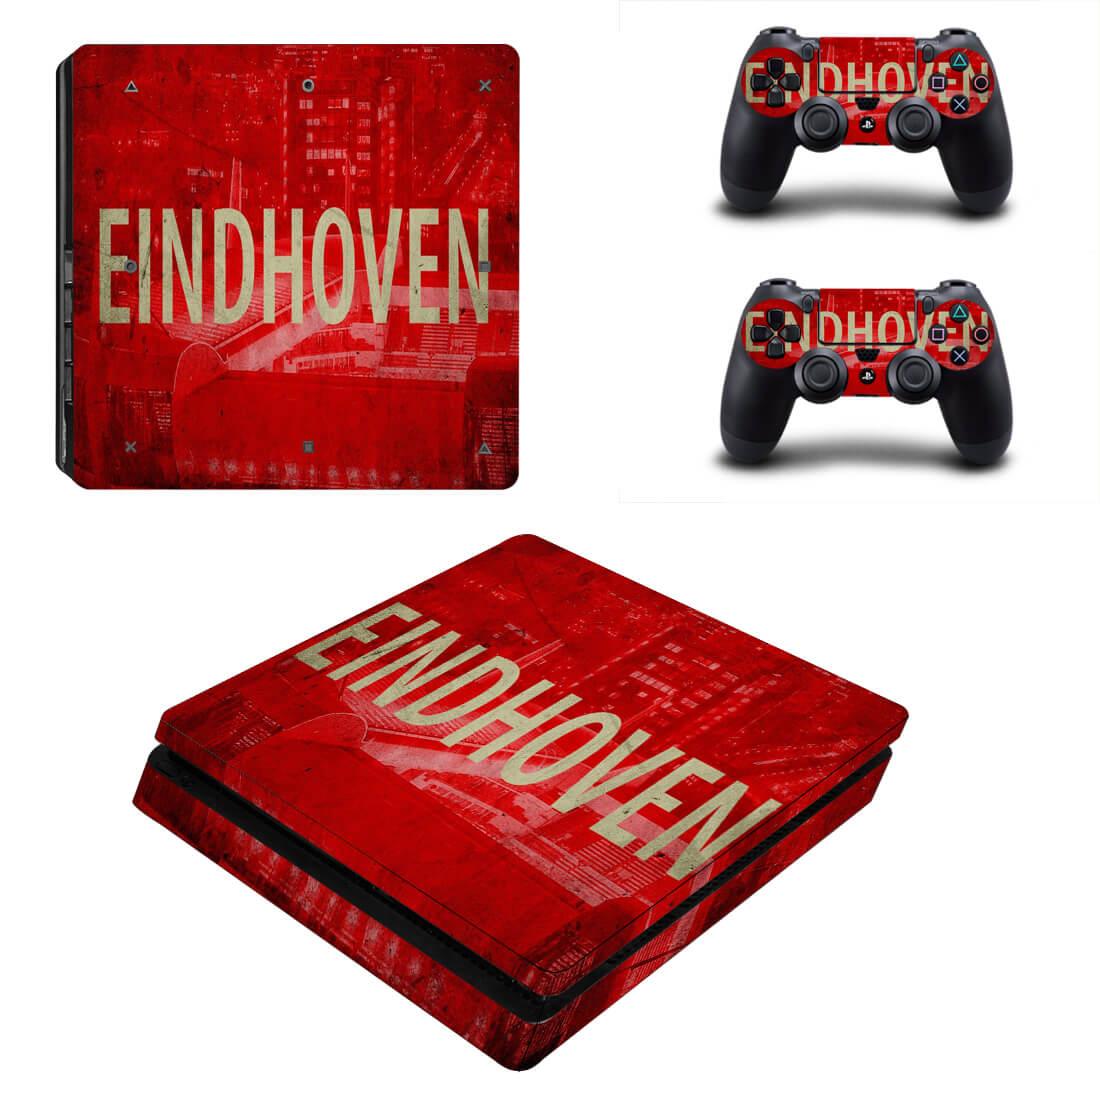 Eindhoven PS4 Slim skin